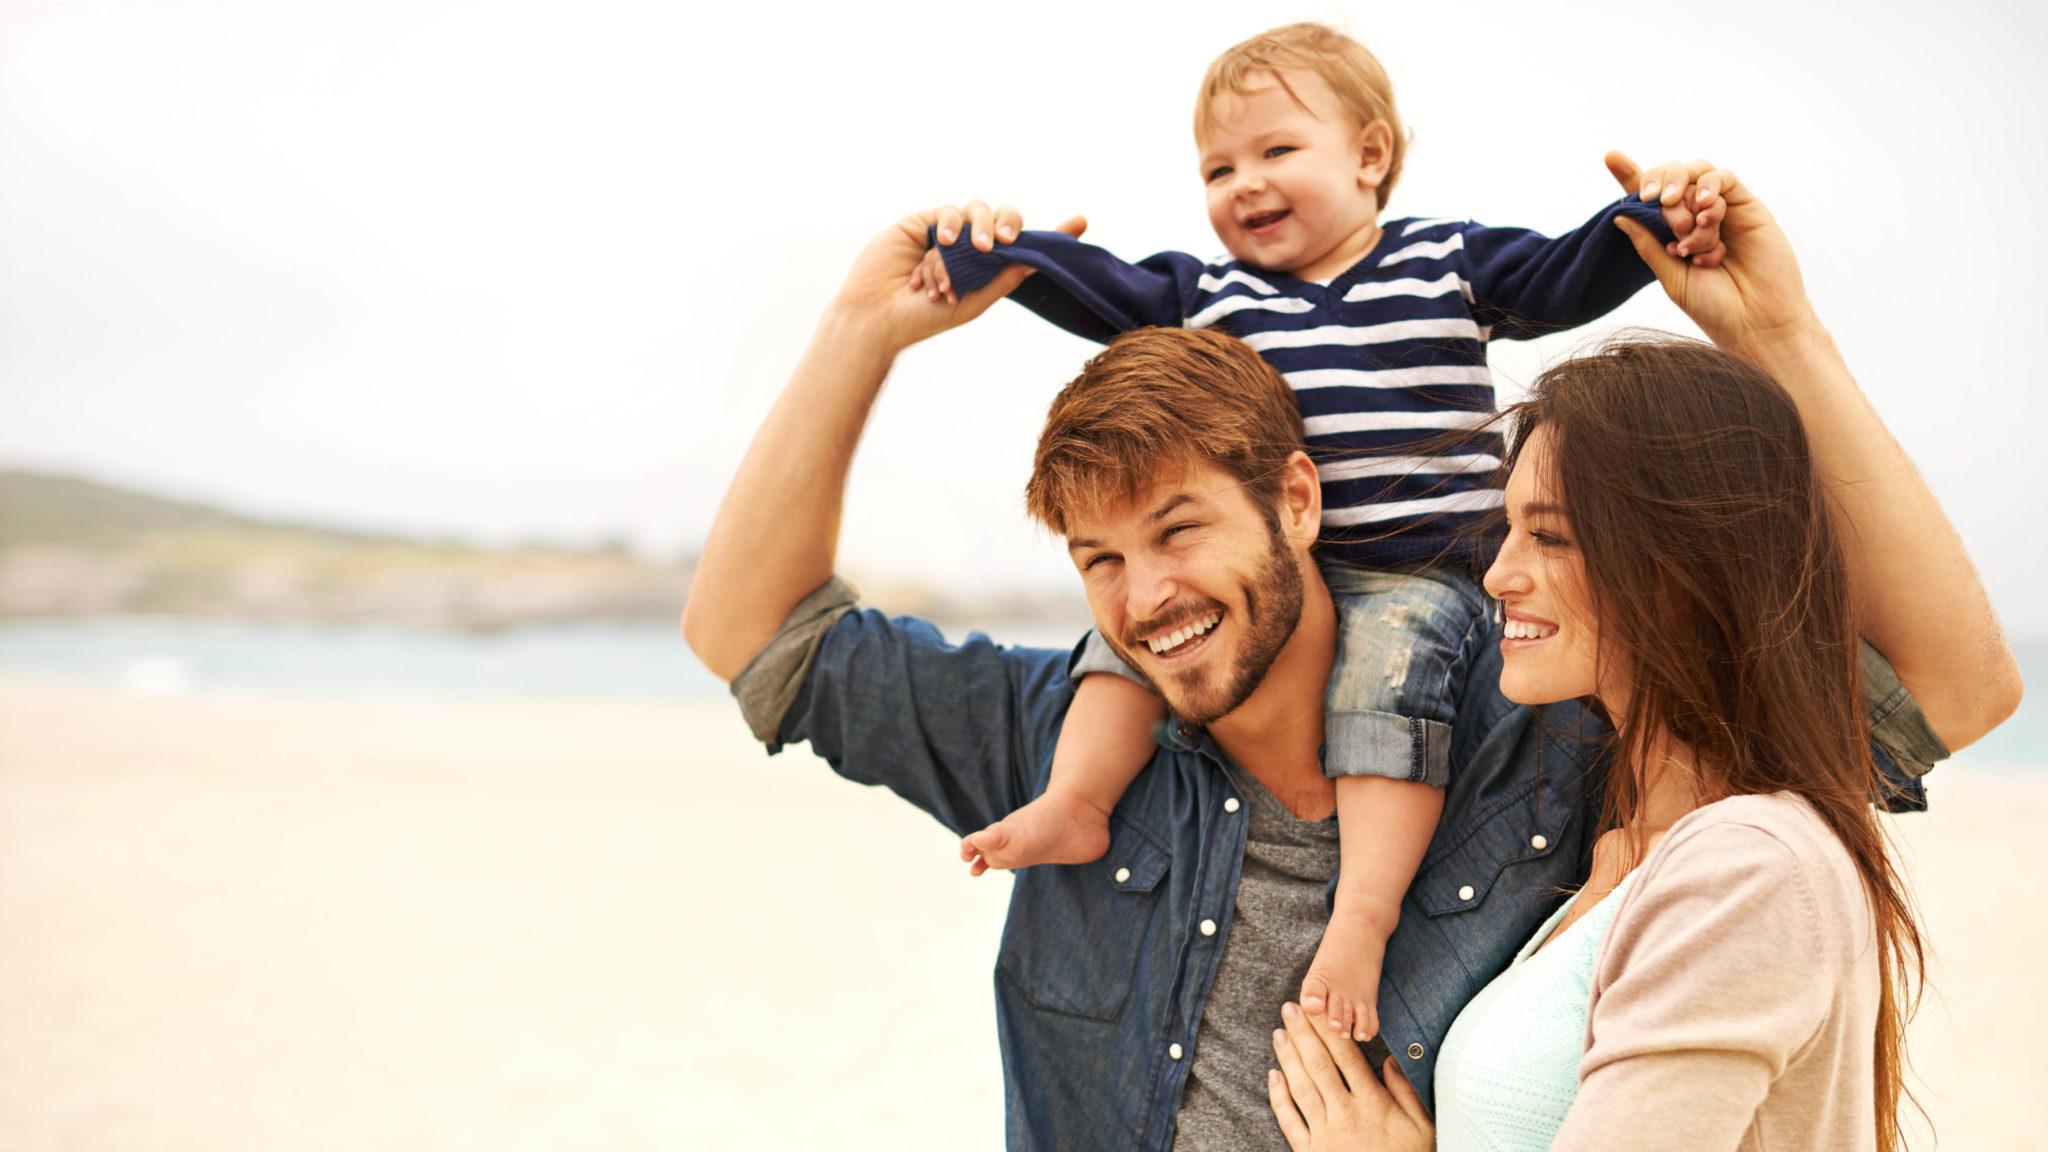 Family of three on the beach